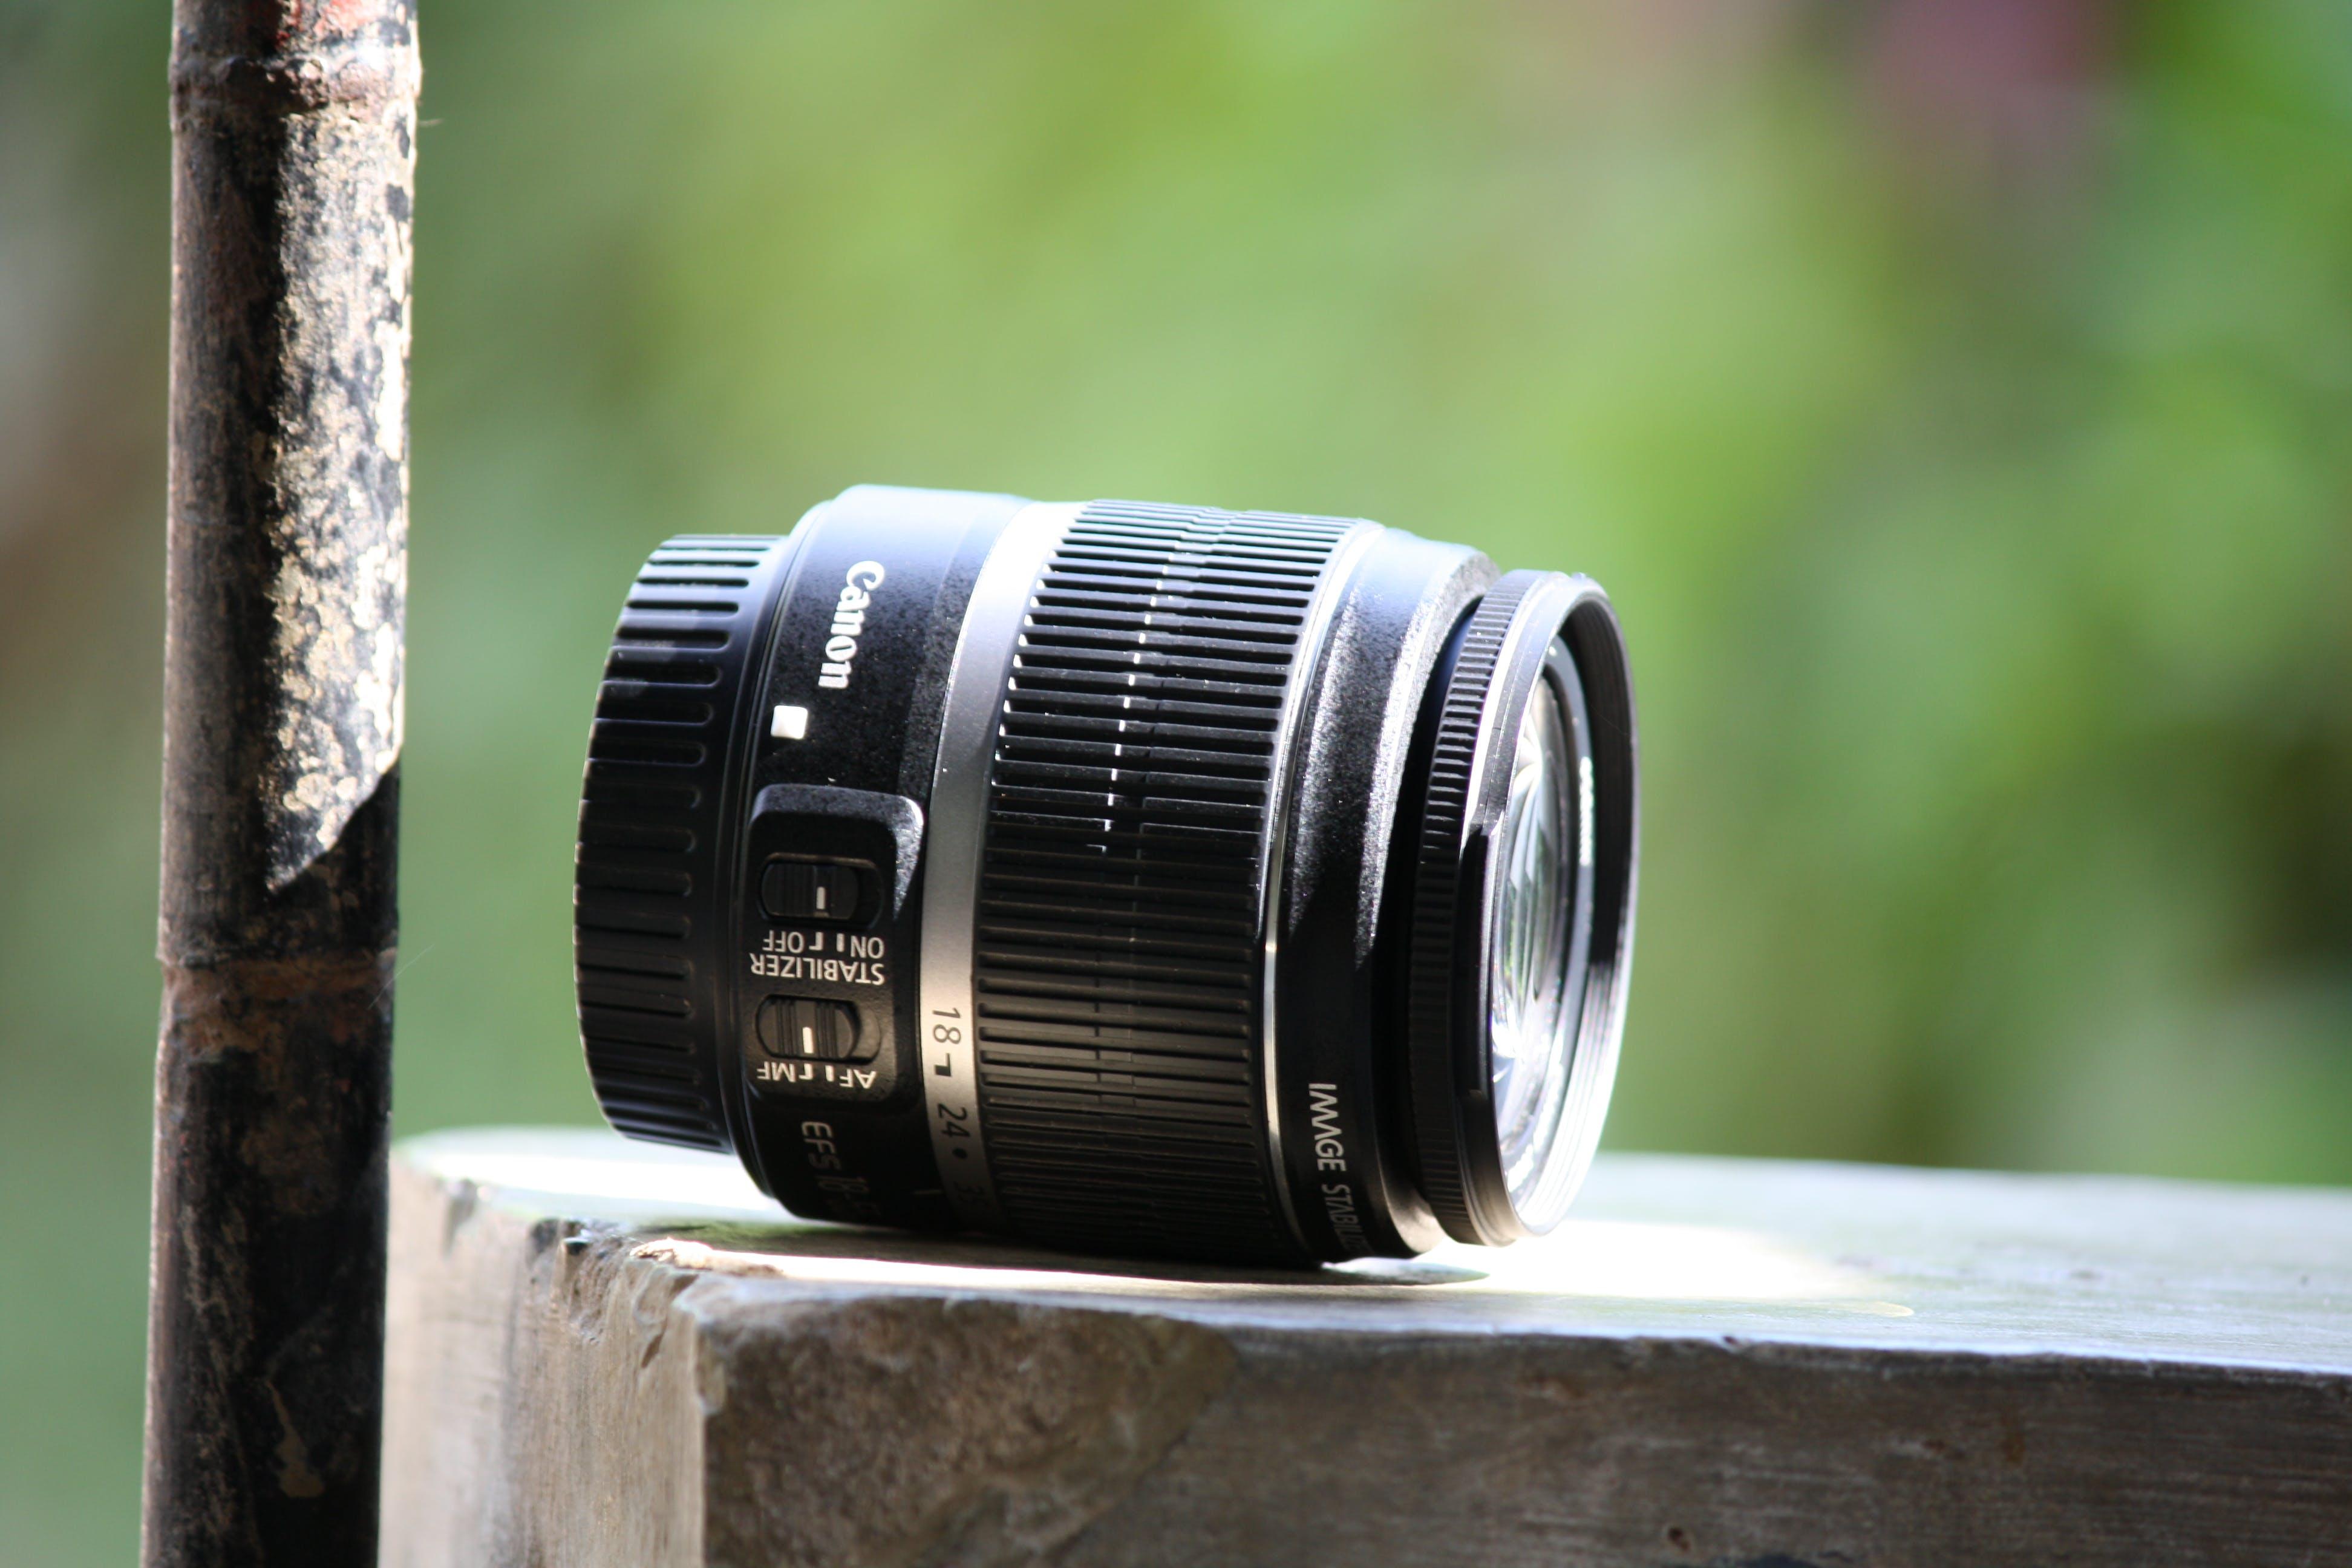 Black Canon Lens on Gray Concrete Table